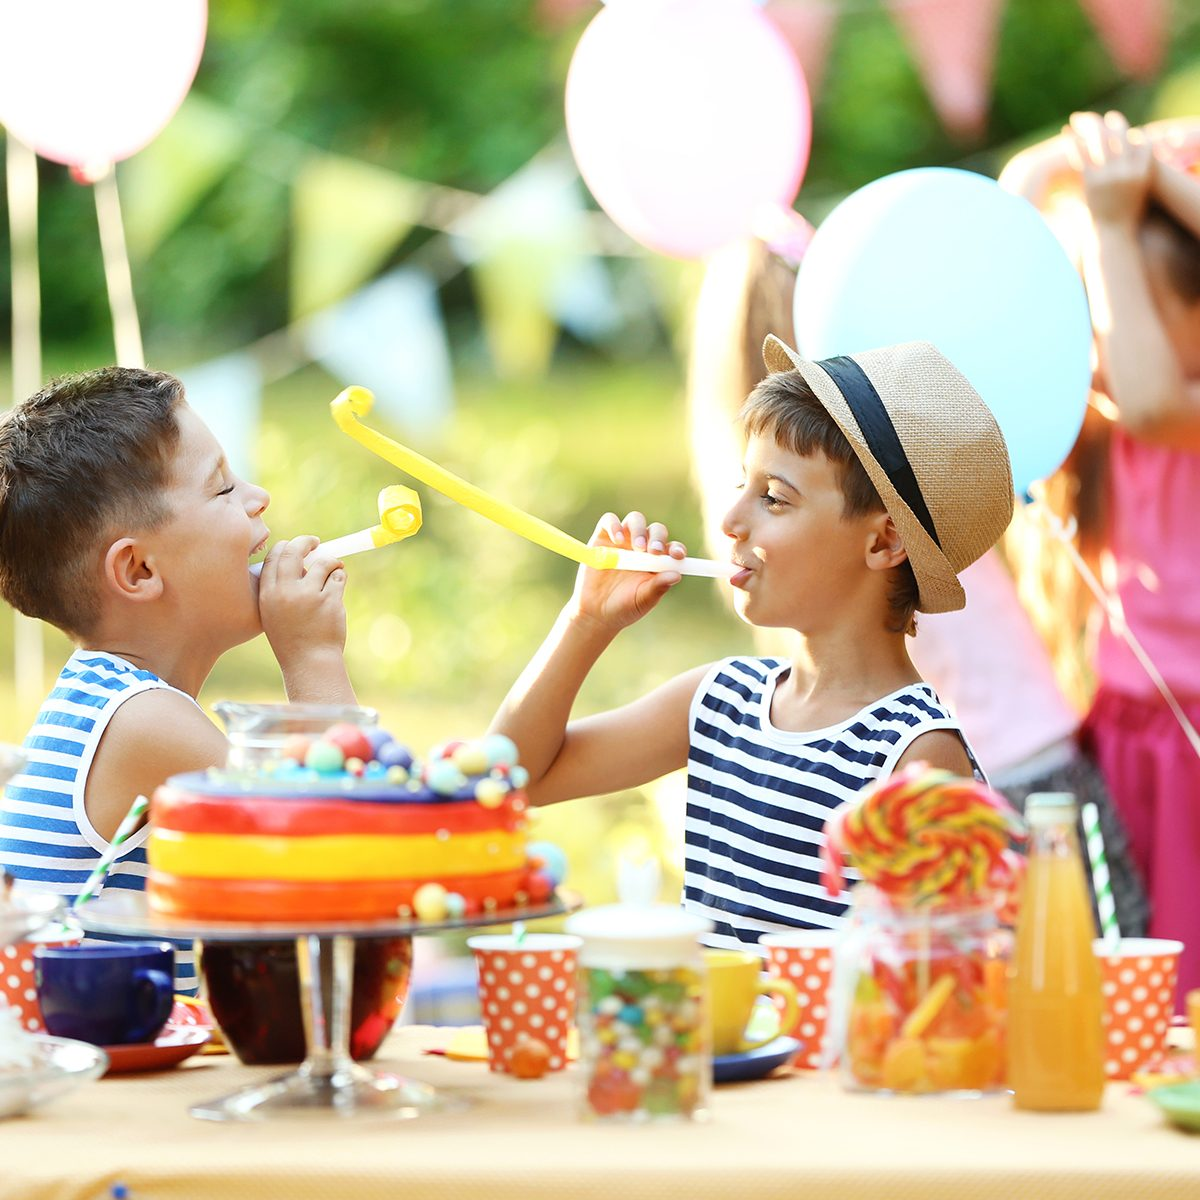 Children celebrating birthday in park